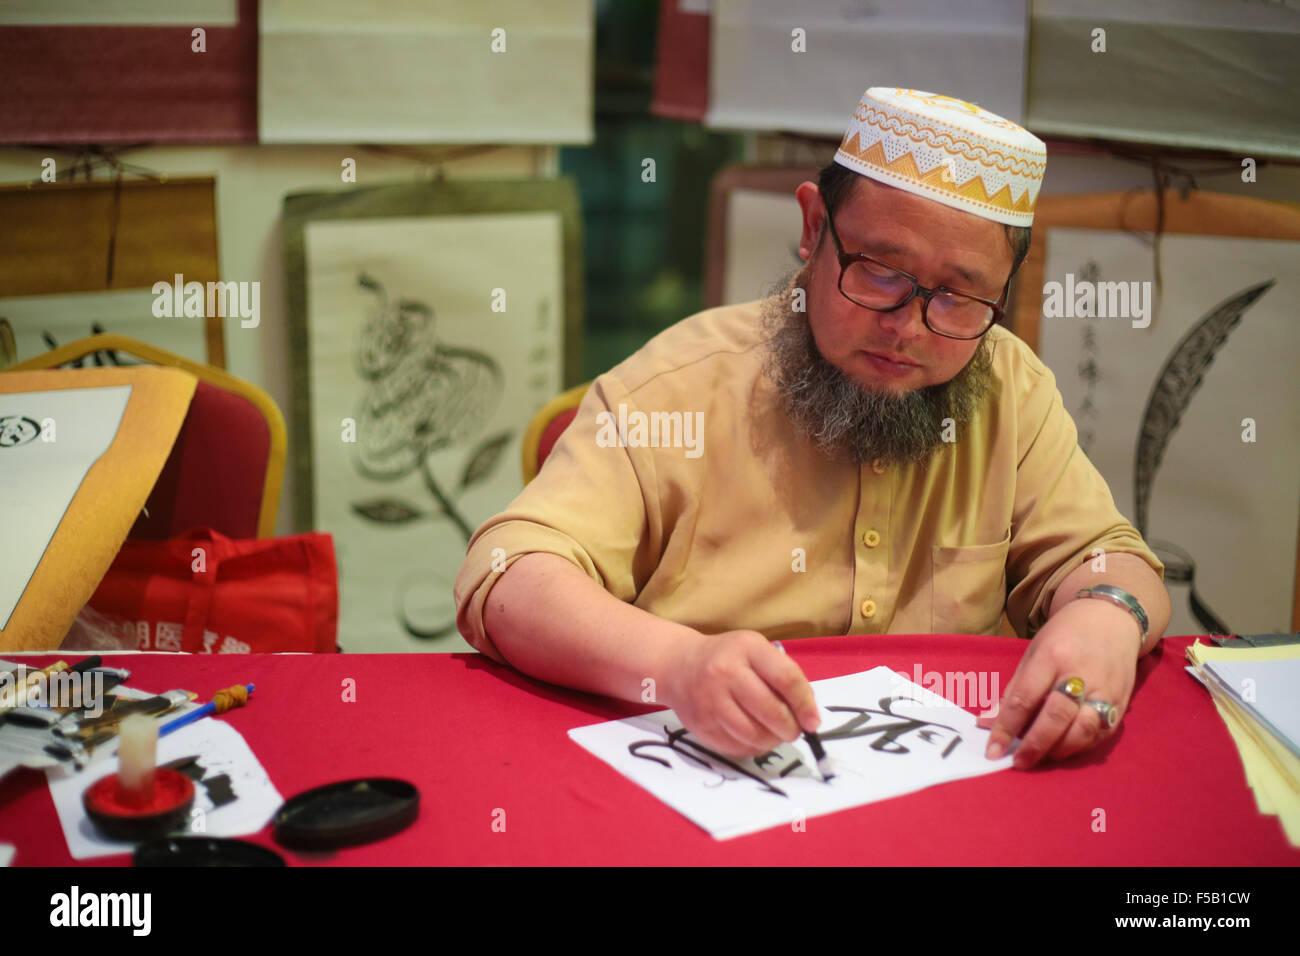 PUTRAJAYA, MALAYSIA, 30 OCT 2015 : A muslim chinese scholar is showcasing islamic caligraphy during Putrajaya International - Stock Image